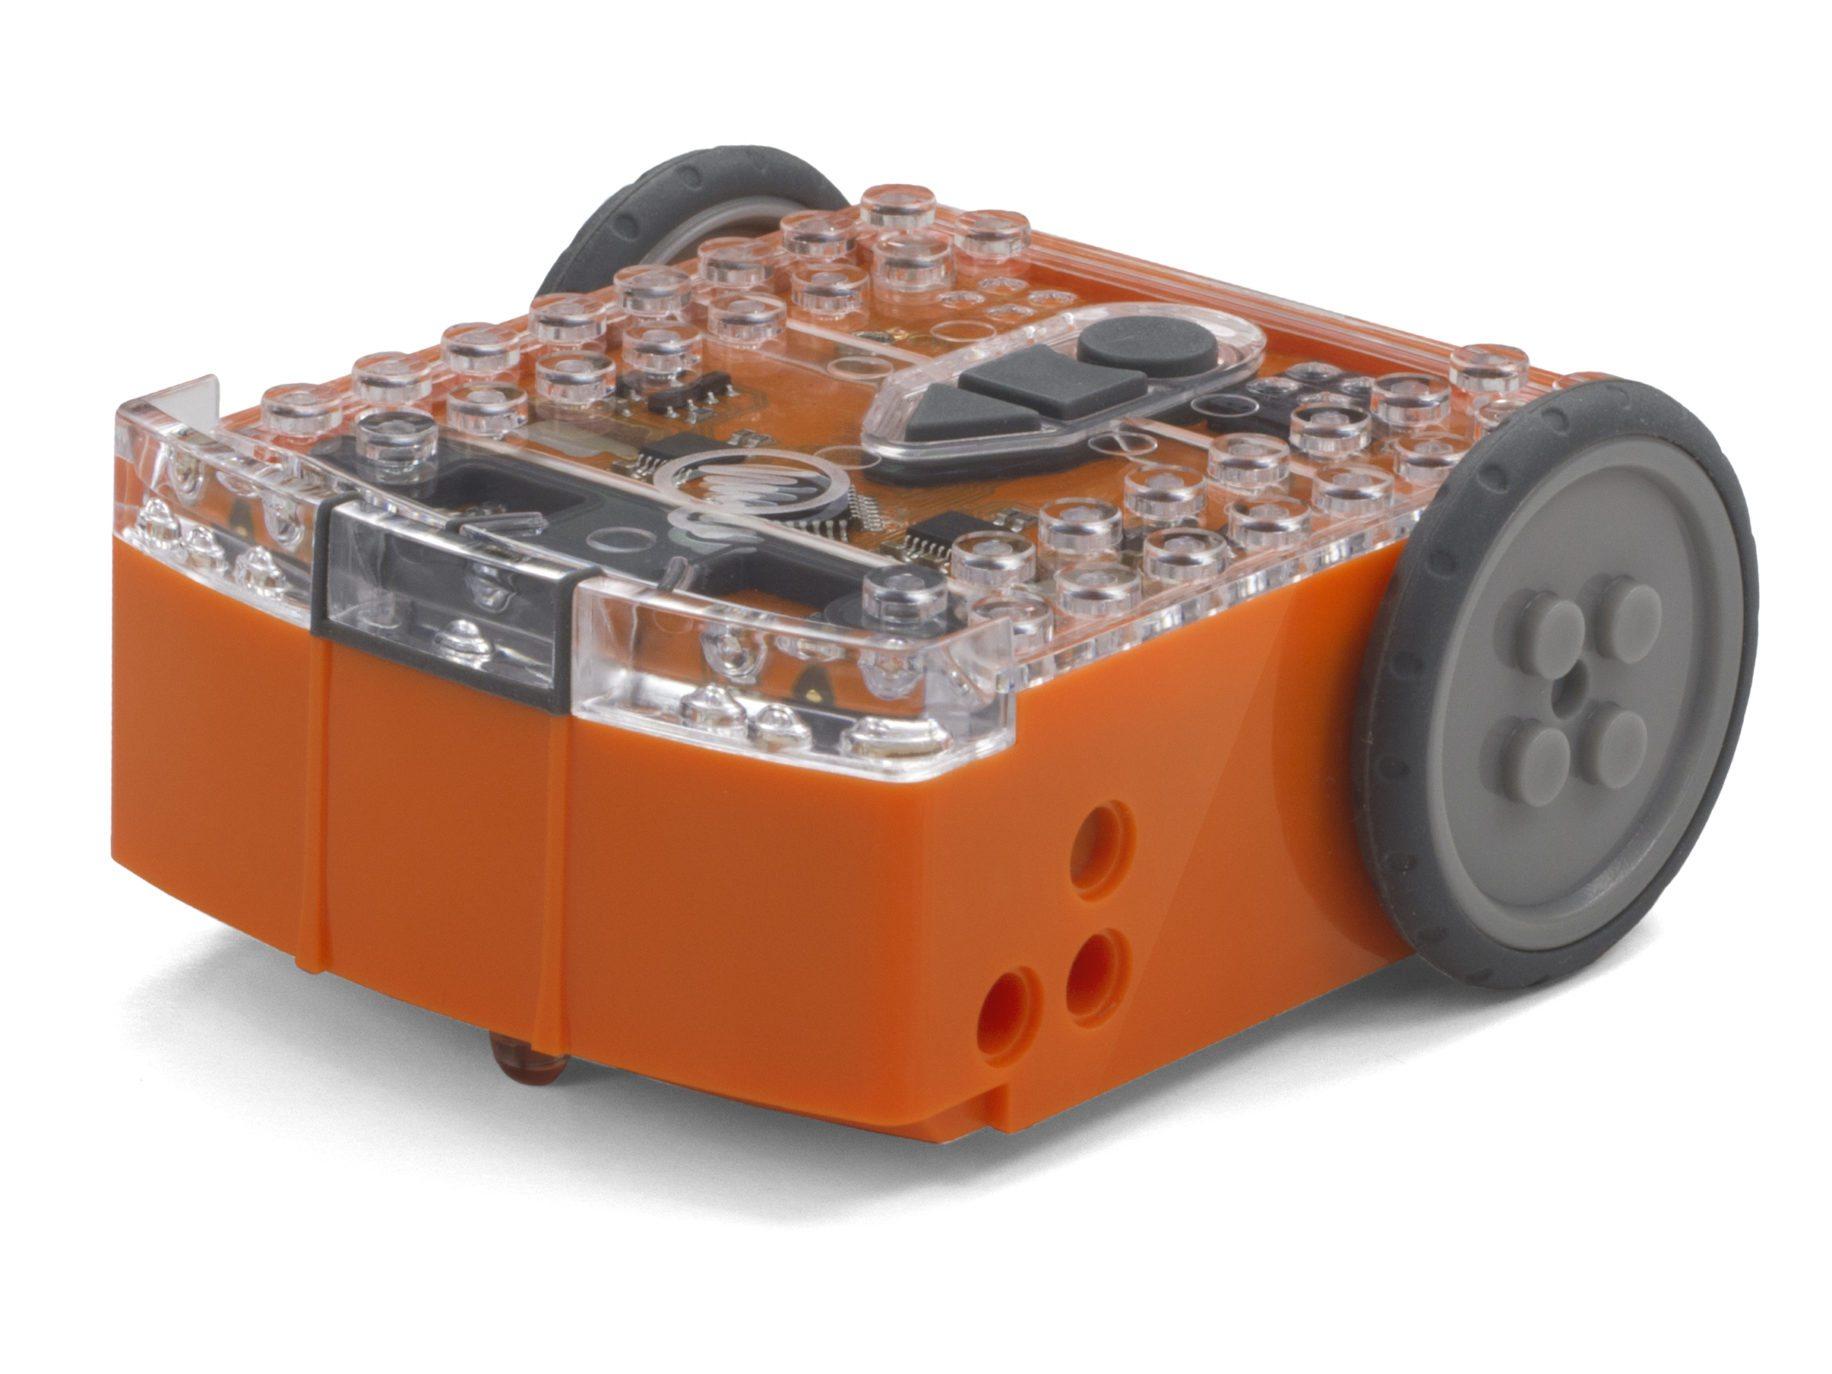 Edison-V2.0-HERO